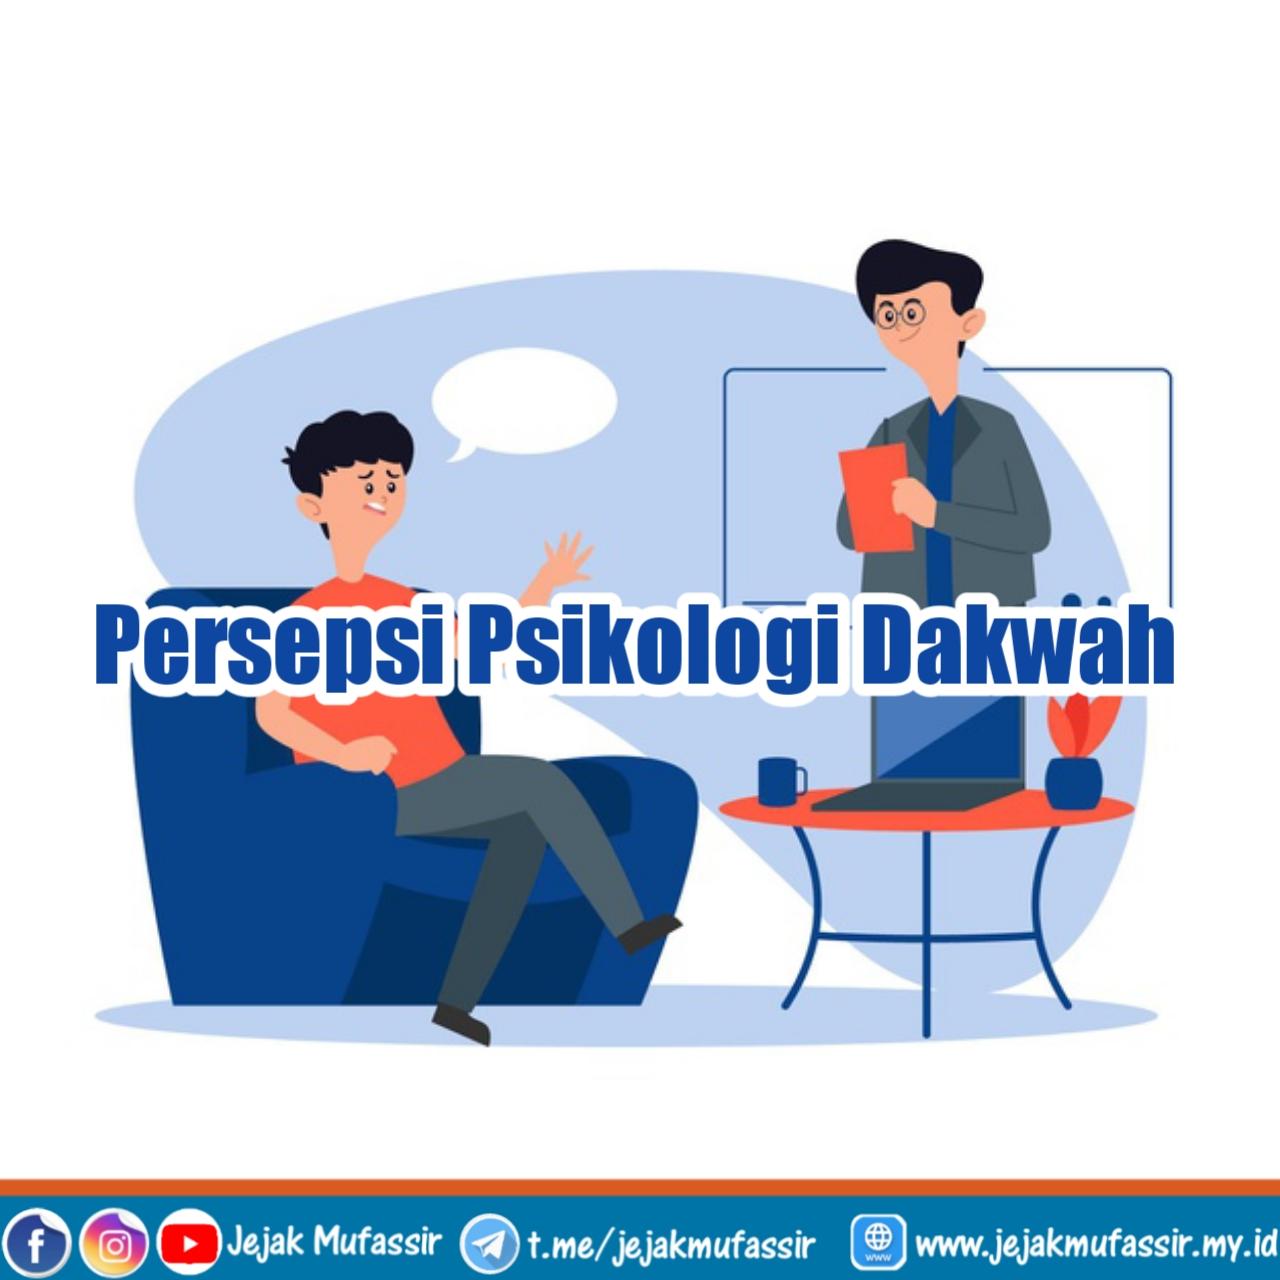 Persepsi Psikologi Dakwah